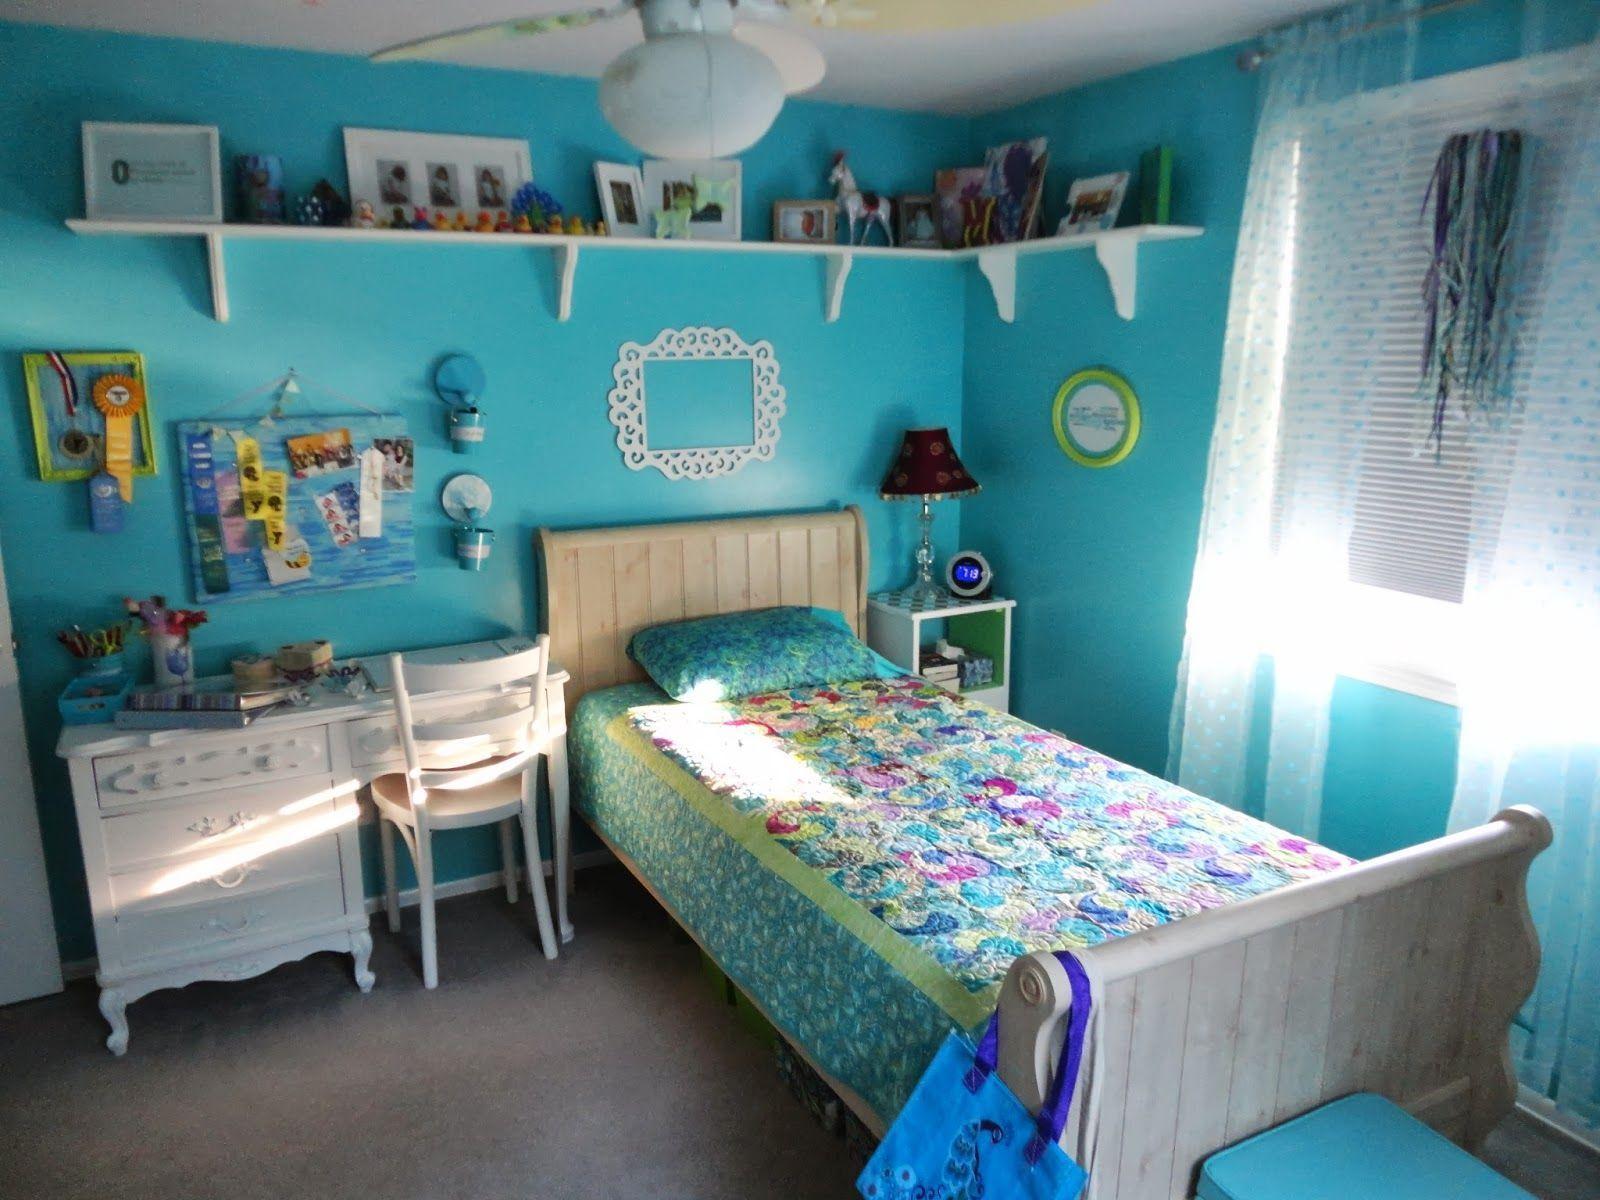 Tween Bedroom Ideas That Are Fun and Cool - #For Girls ... on Teenage Girl:pbu1881B-Jc= Cool Bedroom Ideas  id=24083